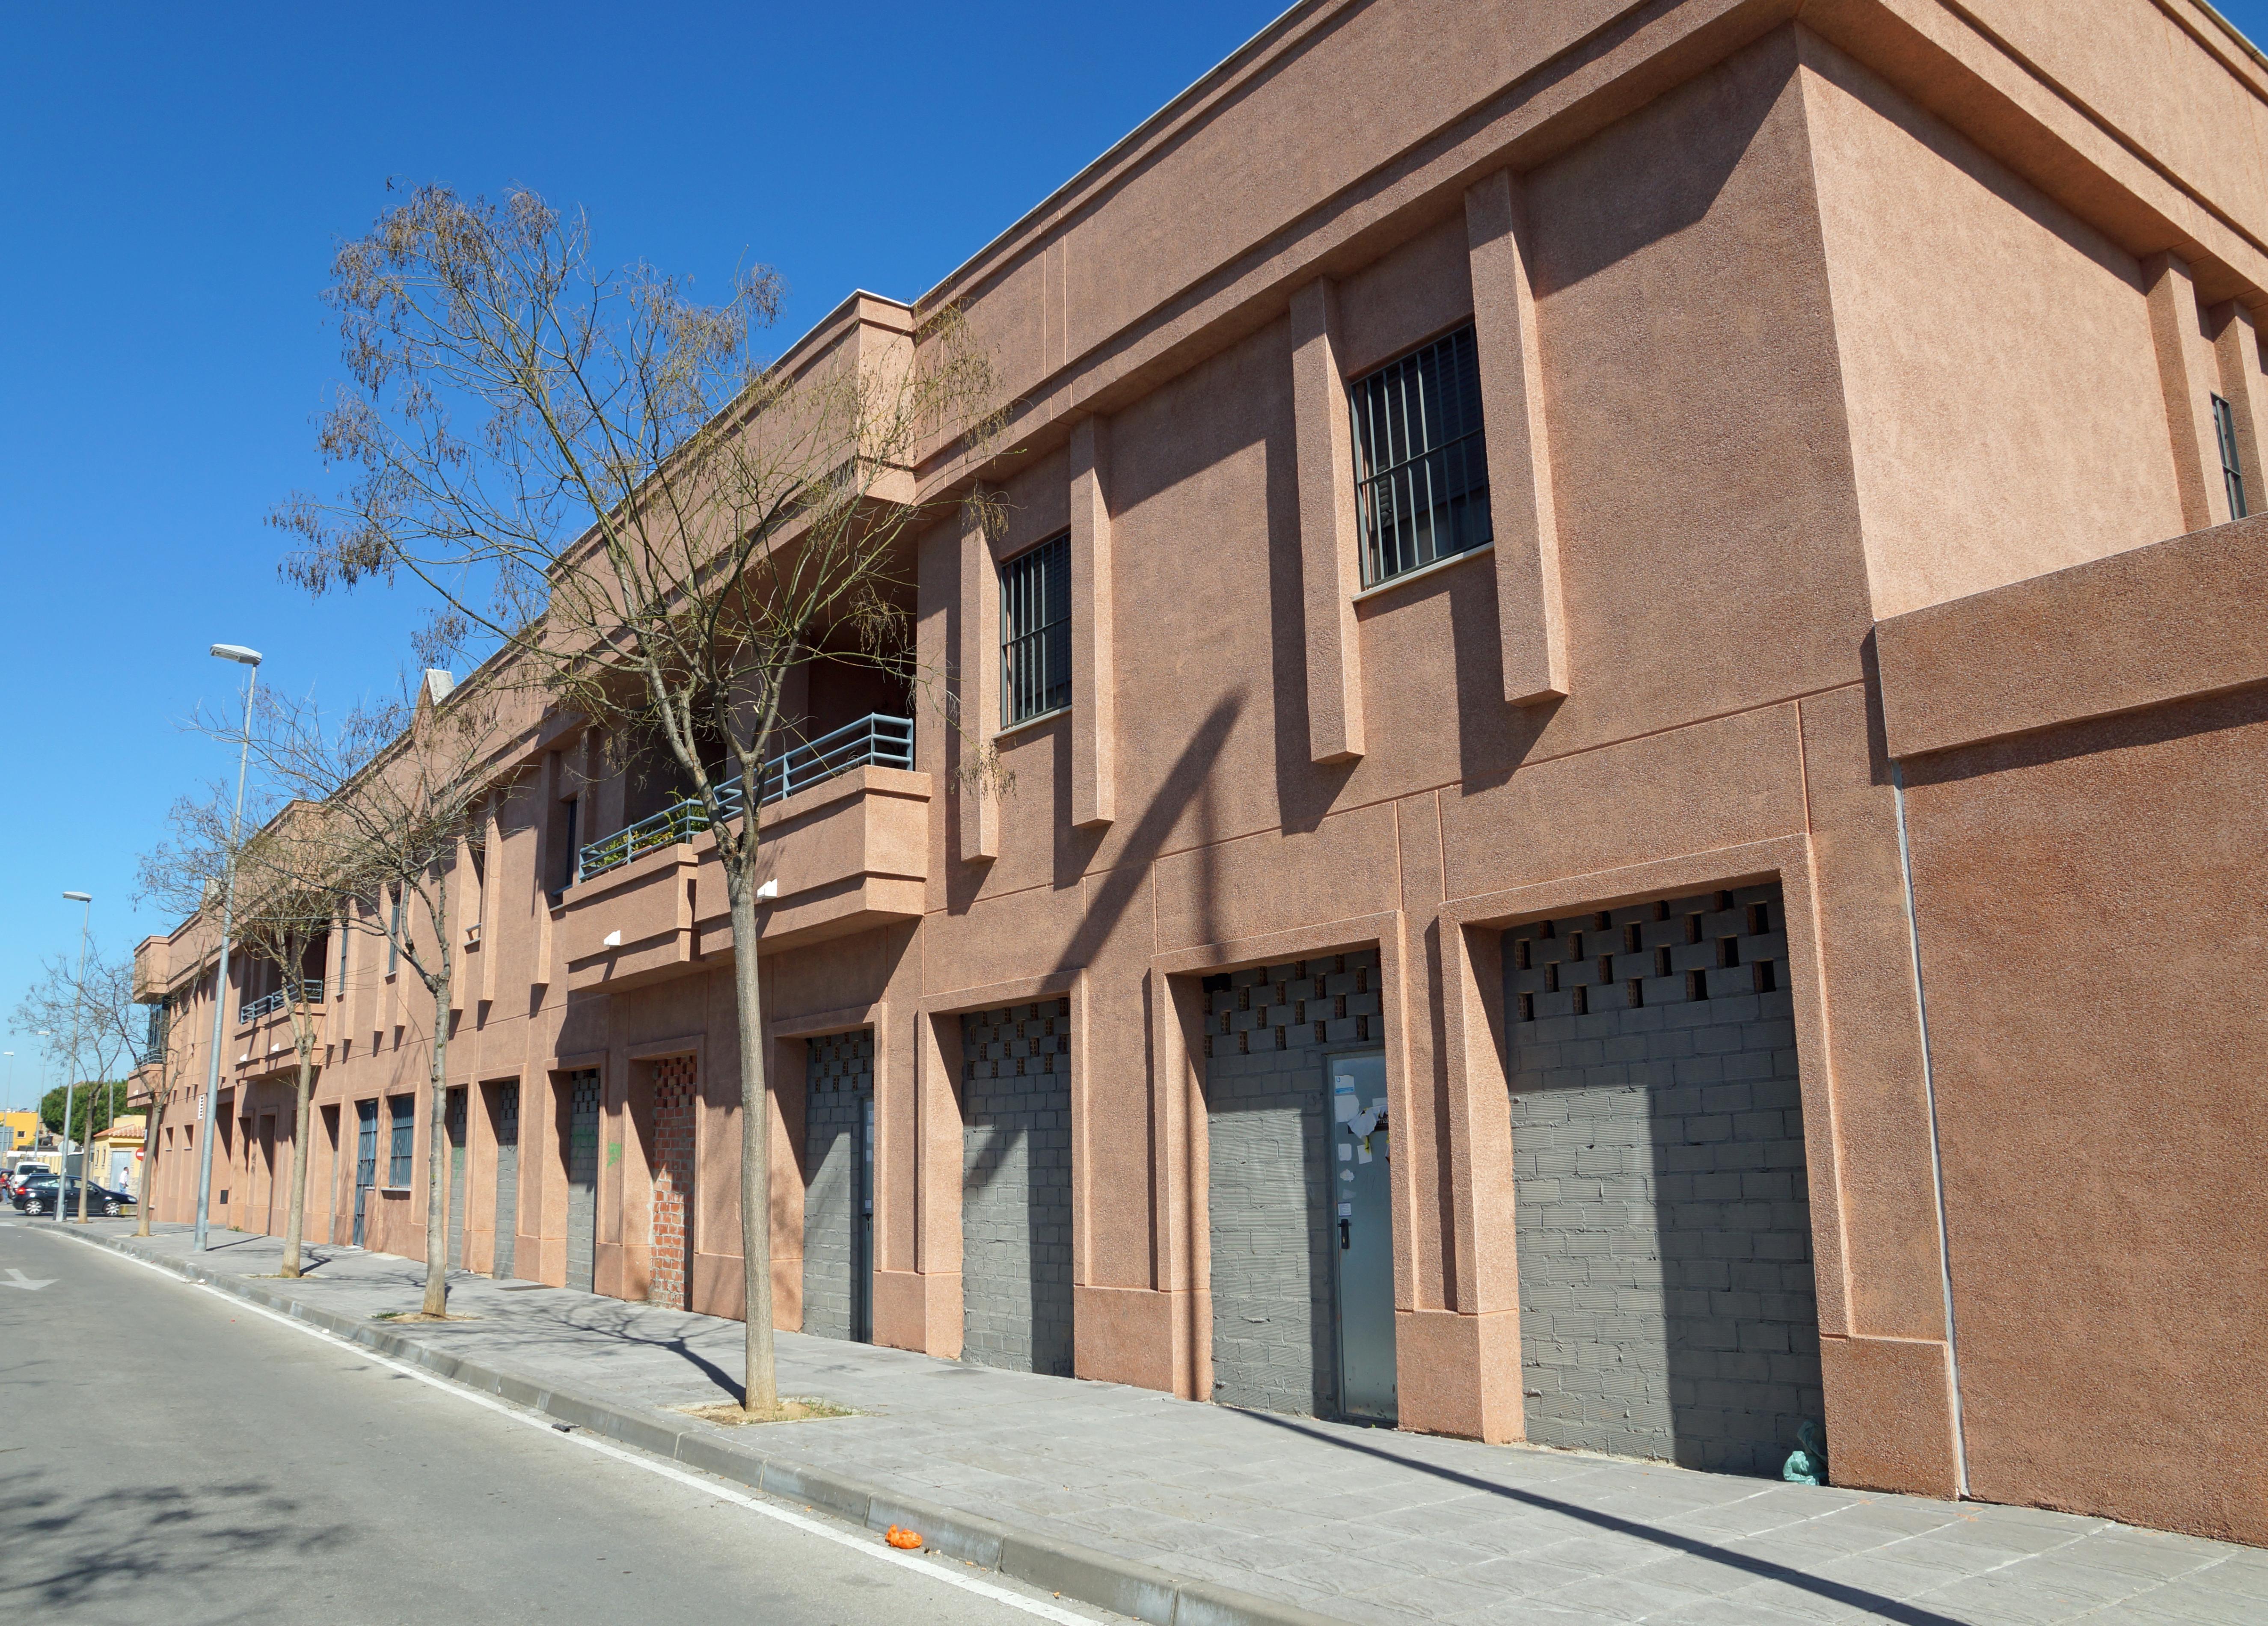 Local en venta en Estella del Marqués, Jerez de la Frontera, Cádiz, Calle Periodista Juan Andres Garcia, 50.700 €, 69 m2